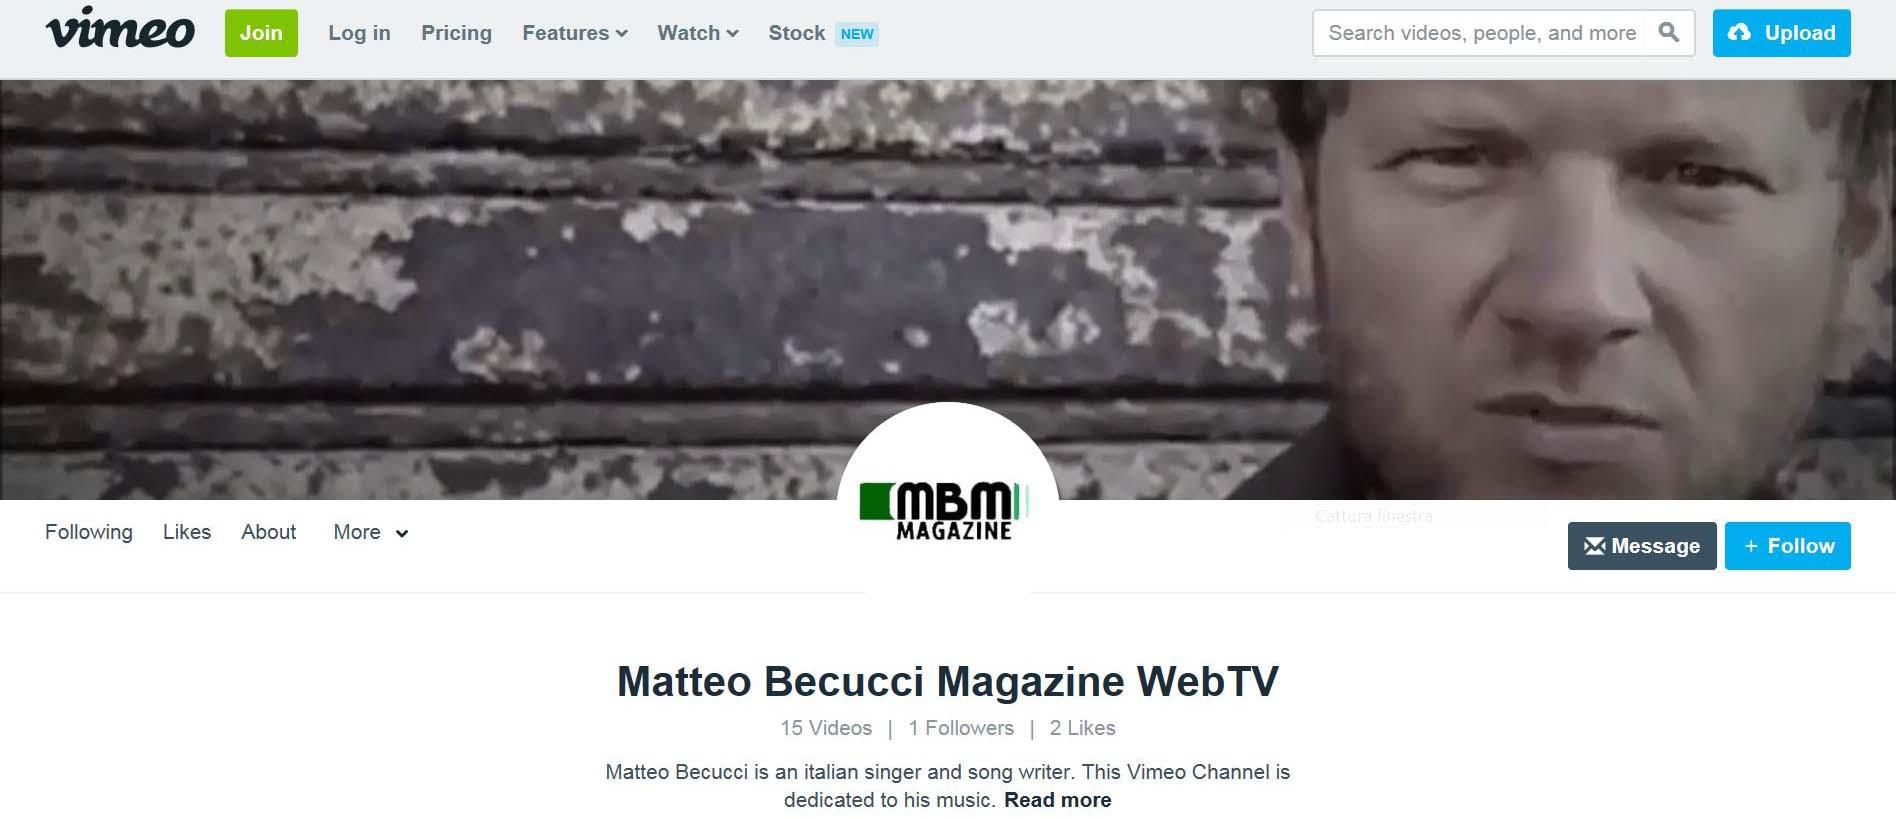 Matteo Becucci Magazine WebTV on Vimeo